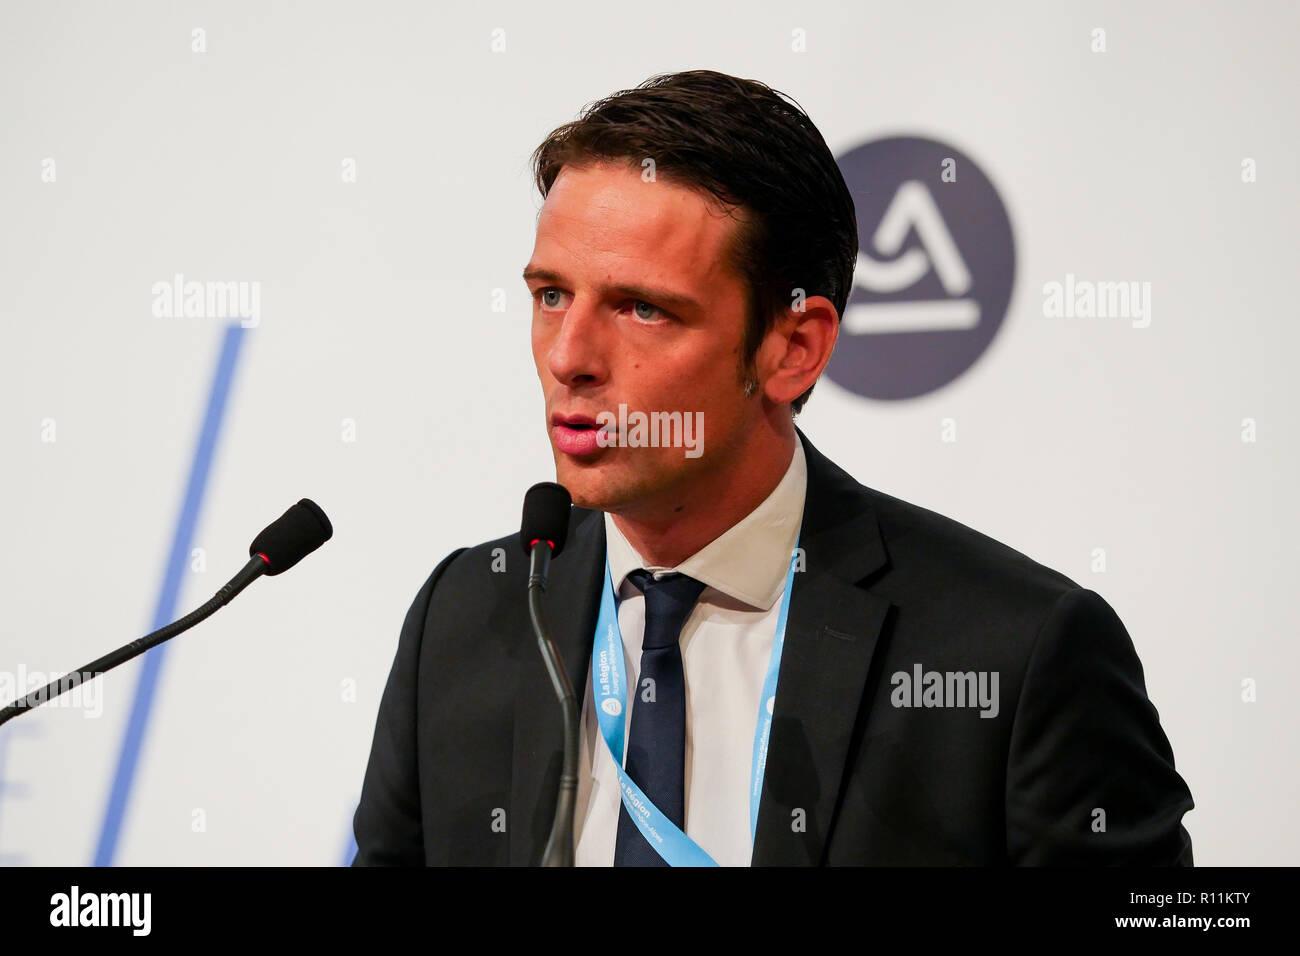 Franck Colcombet, General Director of Tecalemit Aerospace, talks at Regional meetings of Aeronautics and Space Industry, Lyon, France - Stock Image